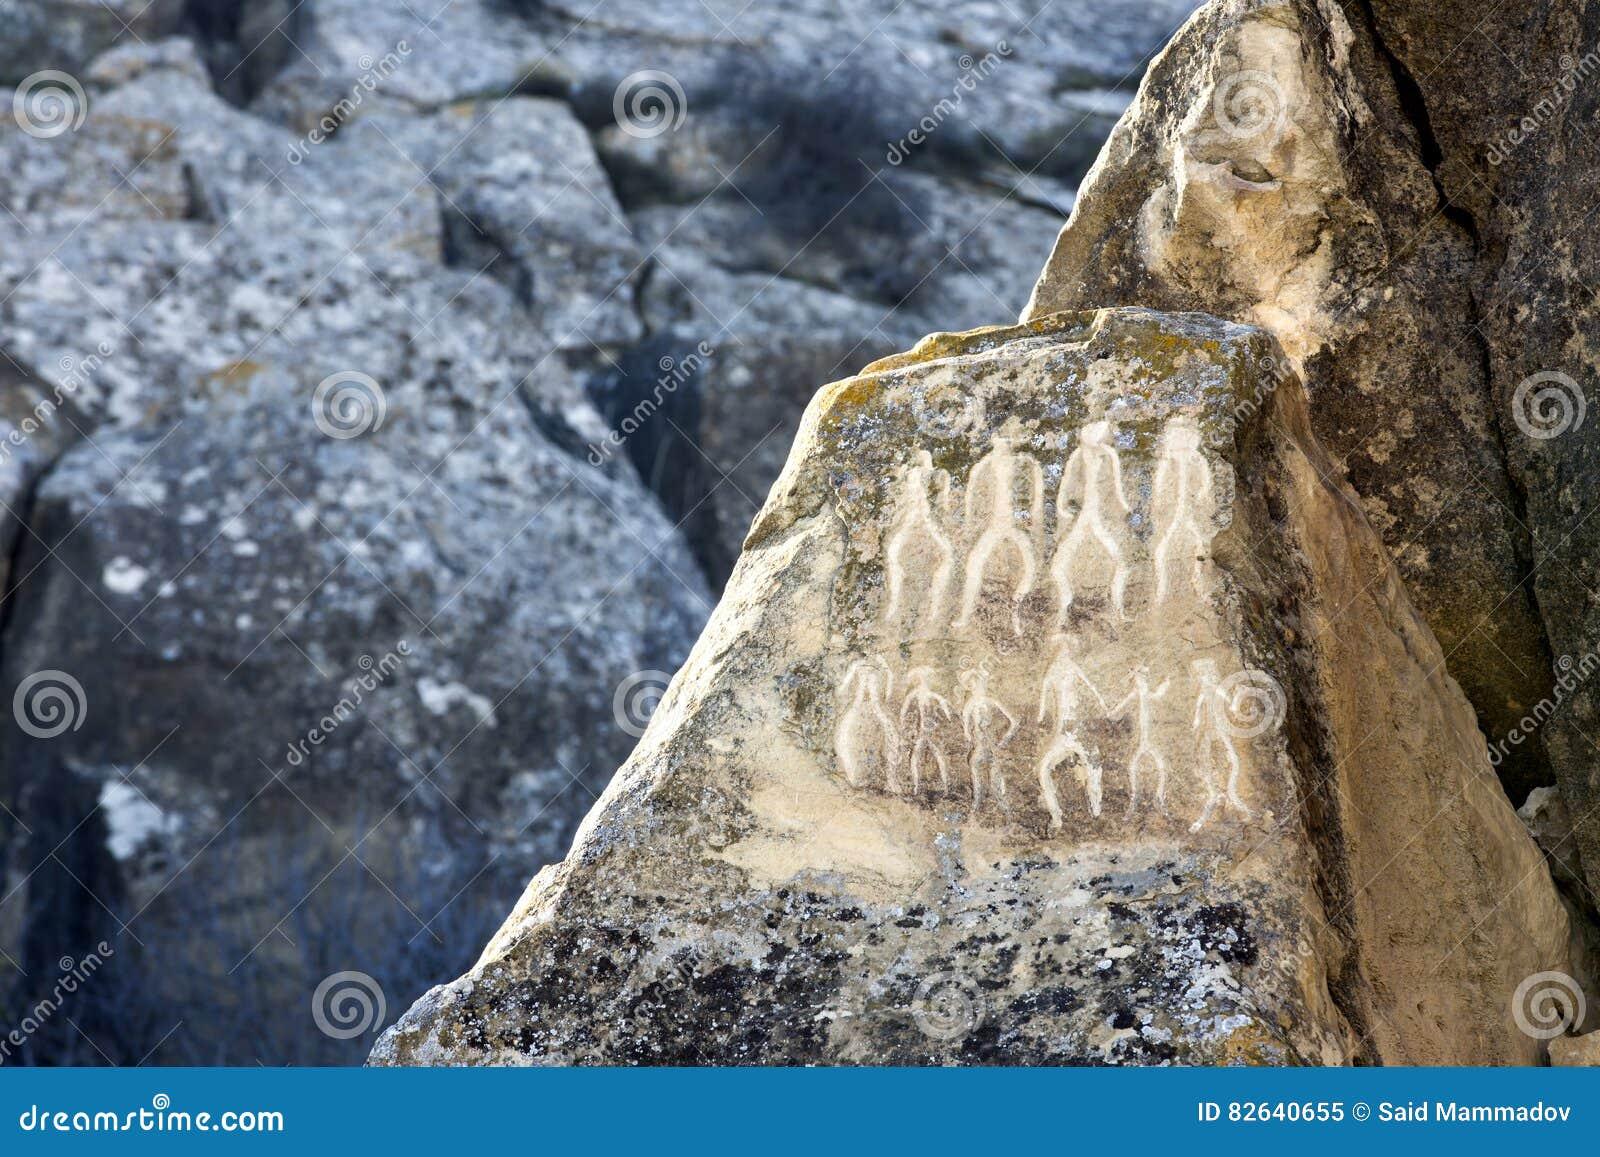 Historical petrographs. Carvings dating back 10 000 BC